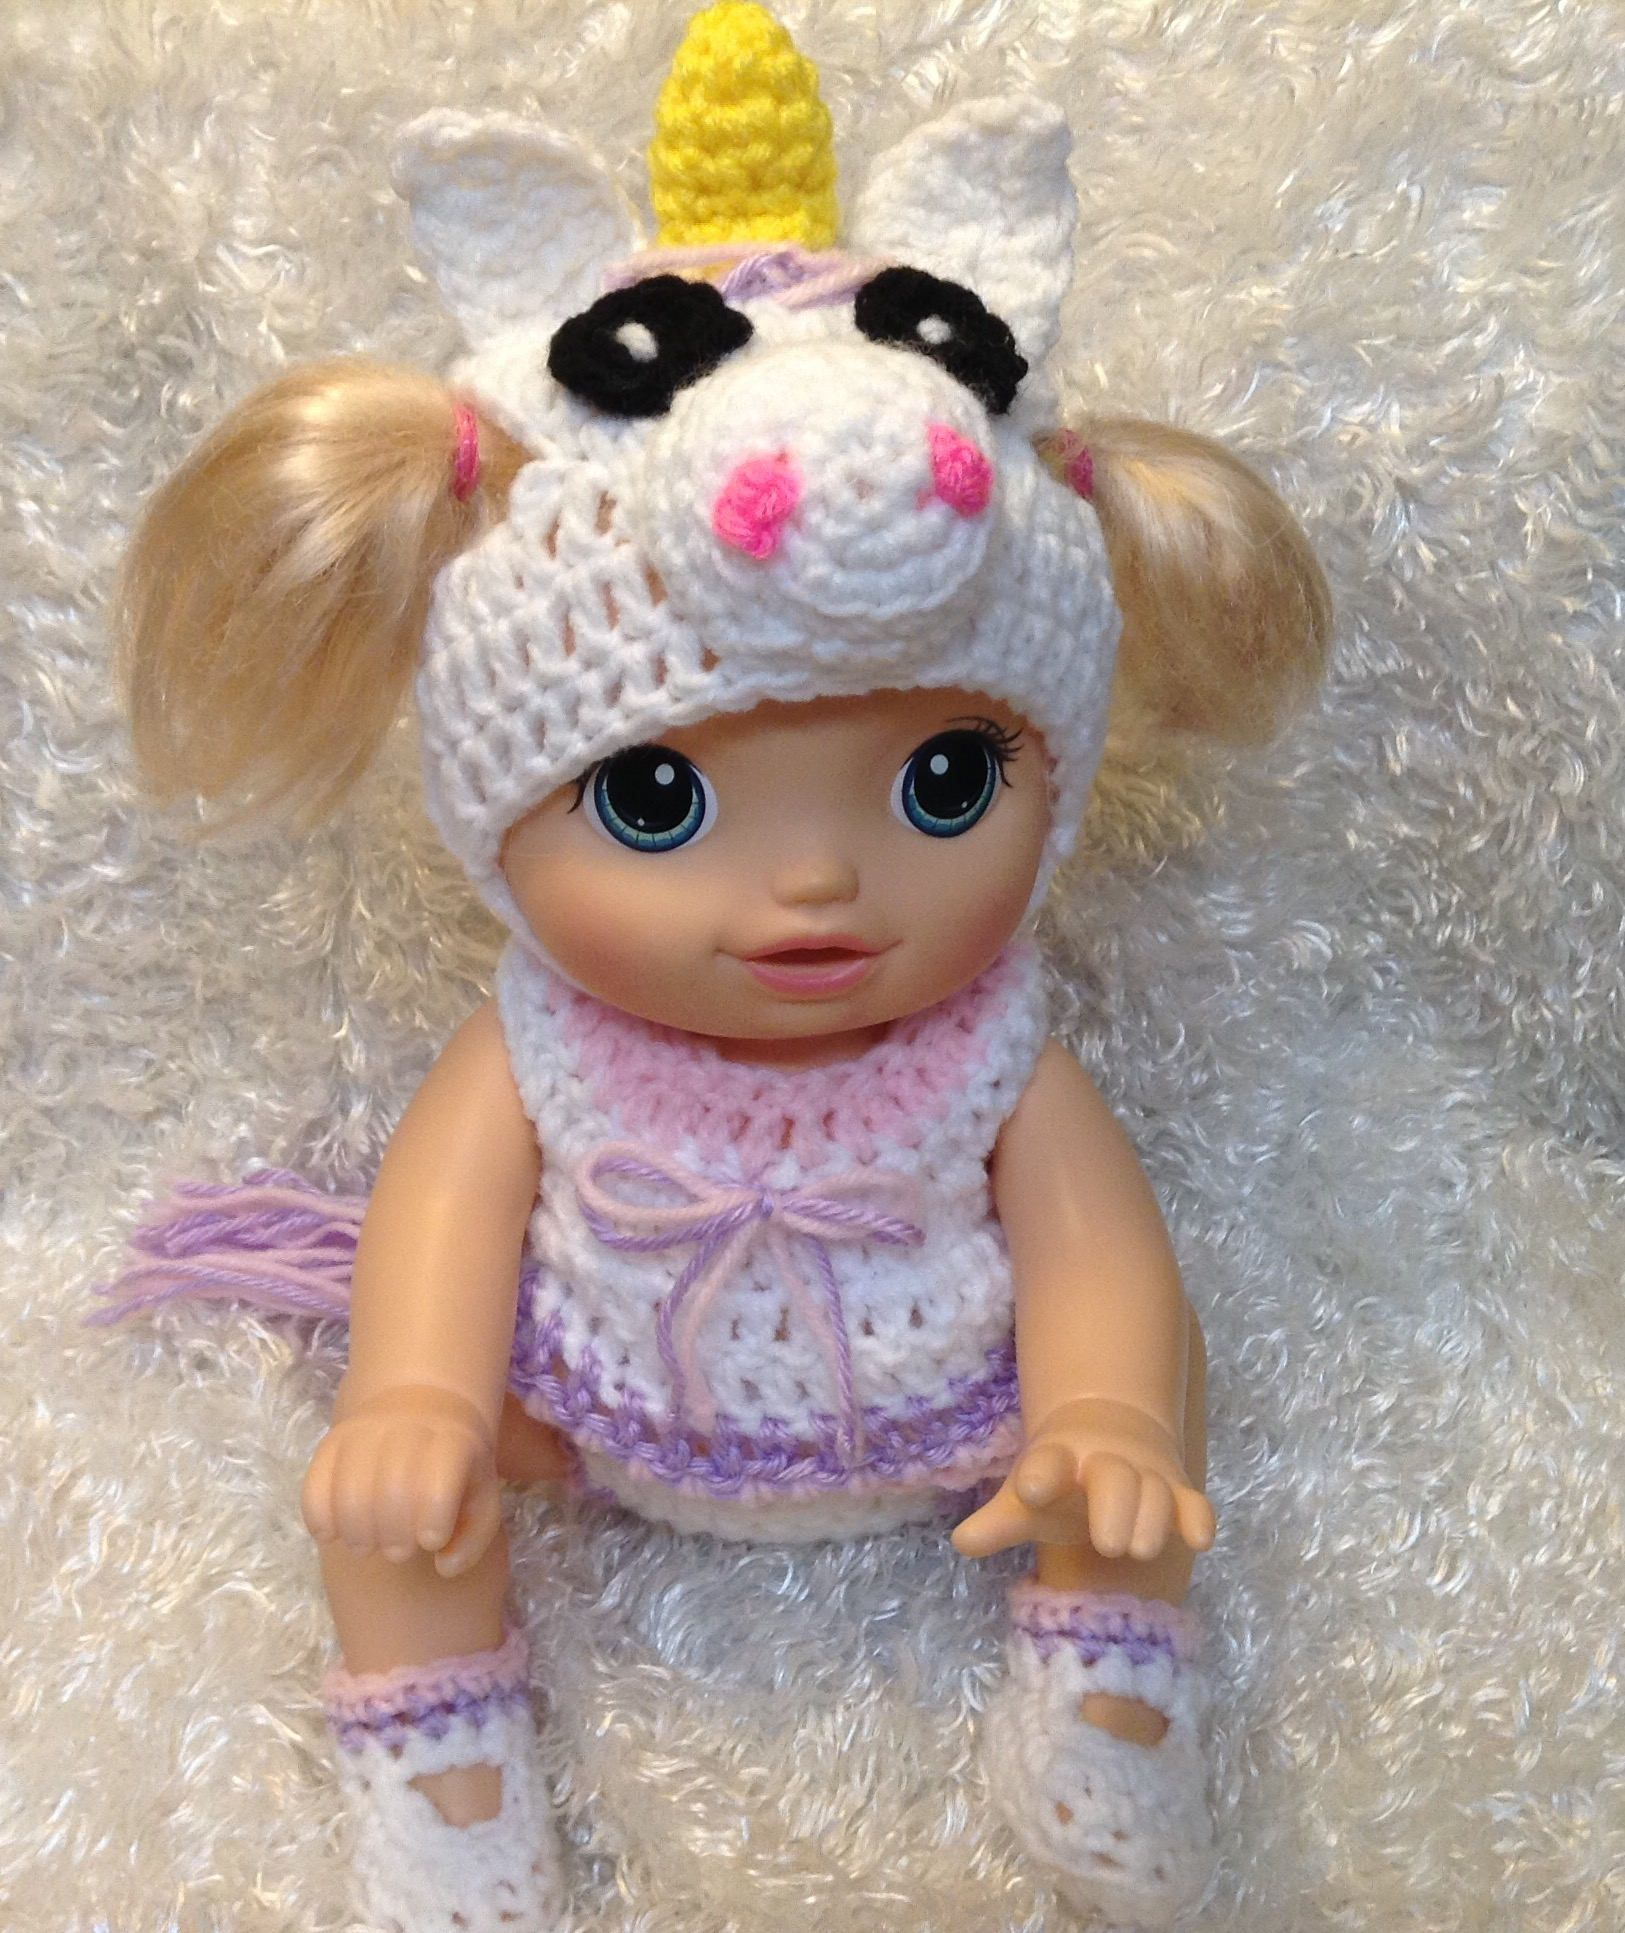 14 Inch Dolls Fits Crawling Go Bye Bye Doll Unicorn Set Baby Alive Baby Alive Doll Clothes Baby Alive Dolls